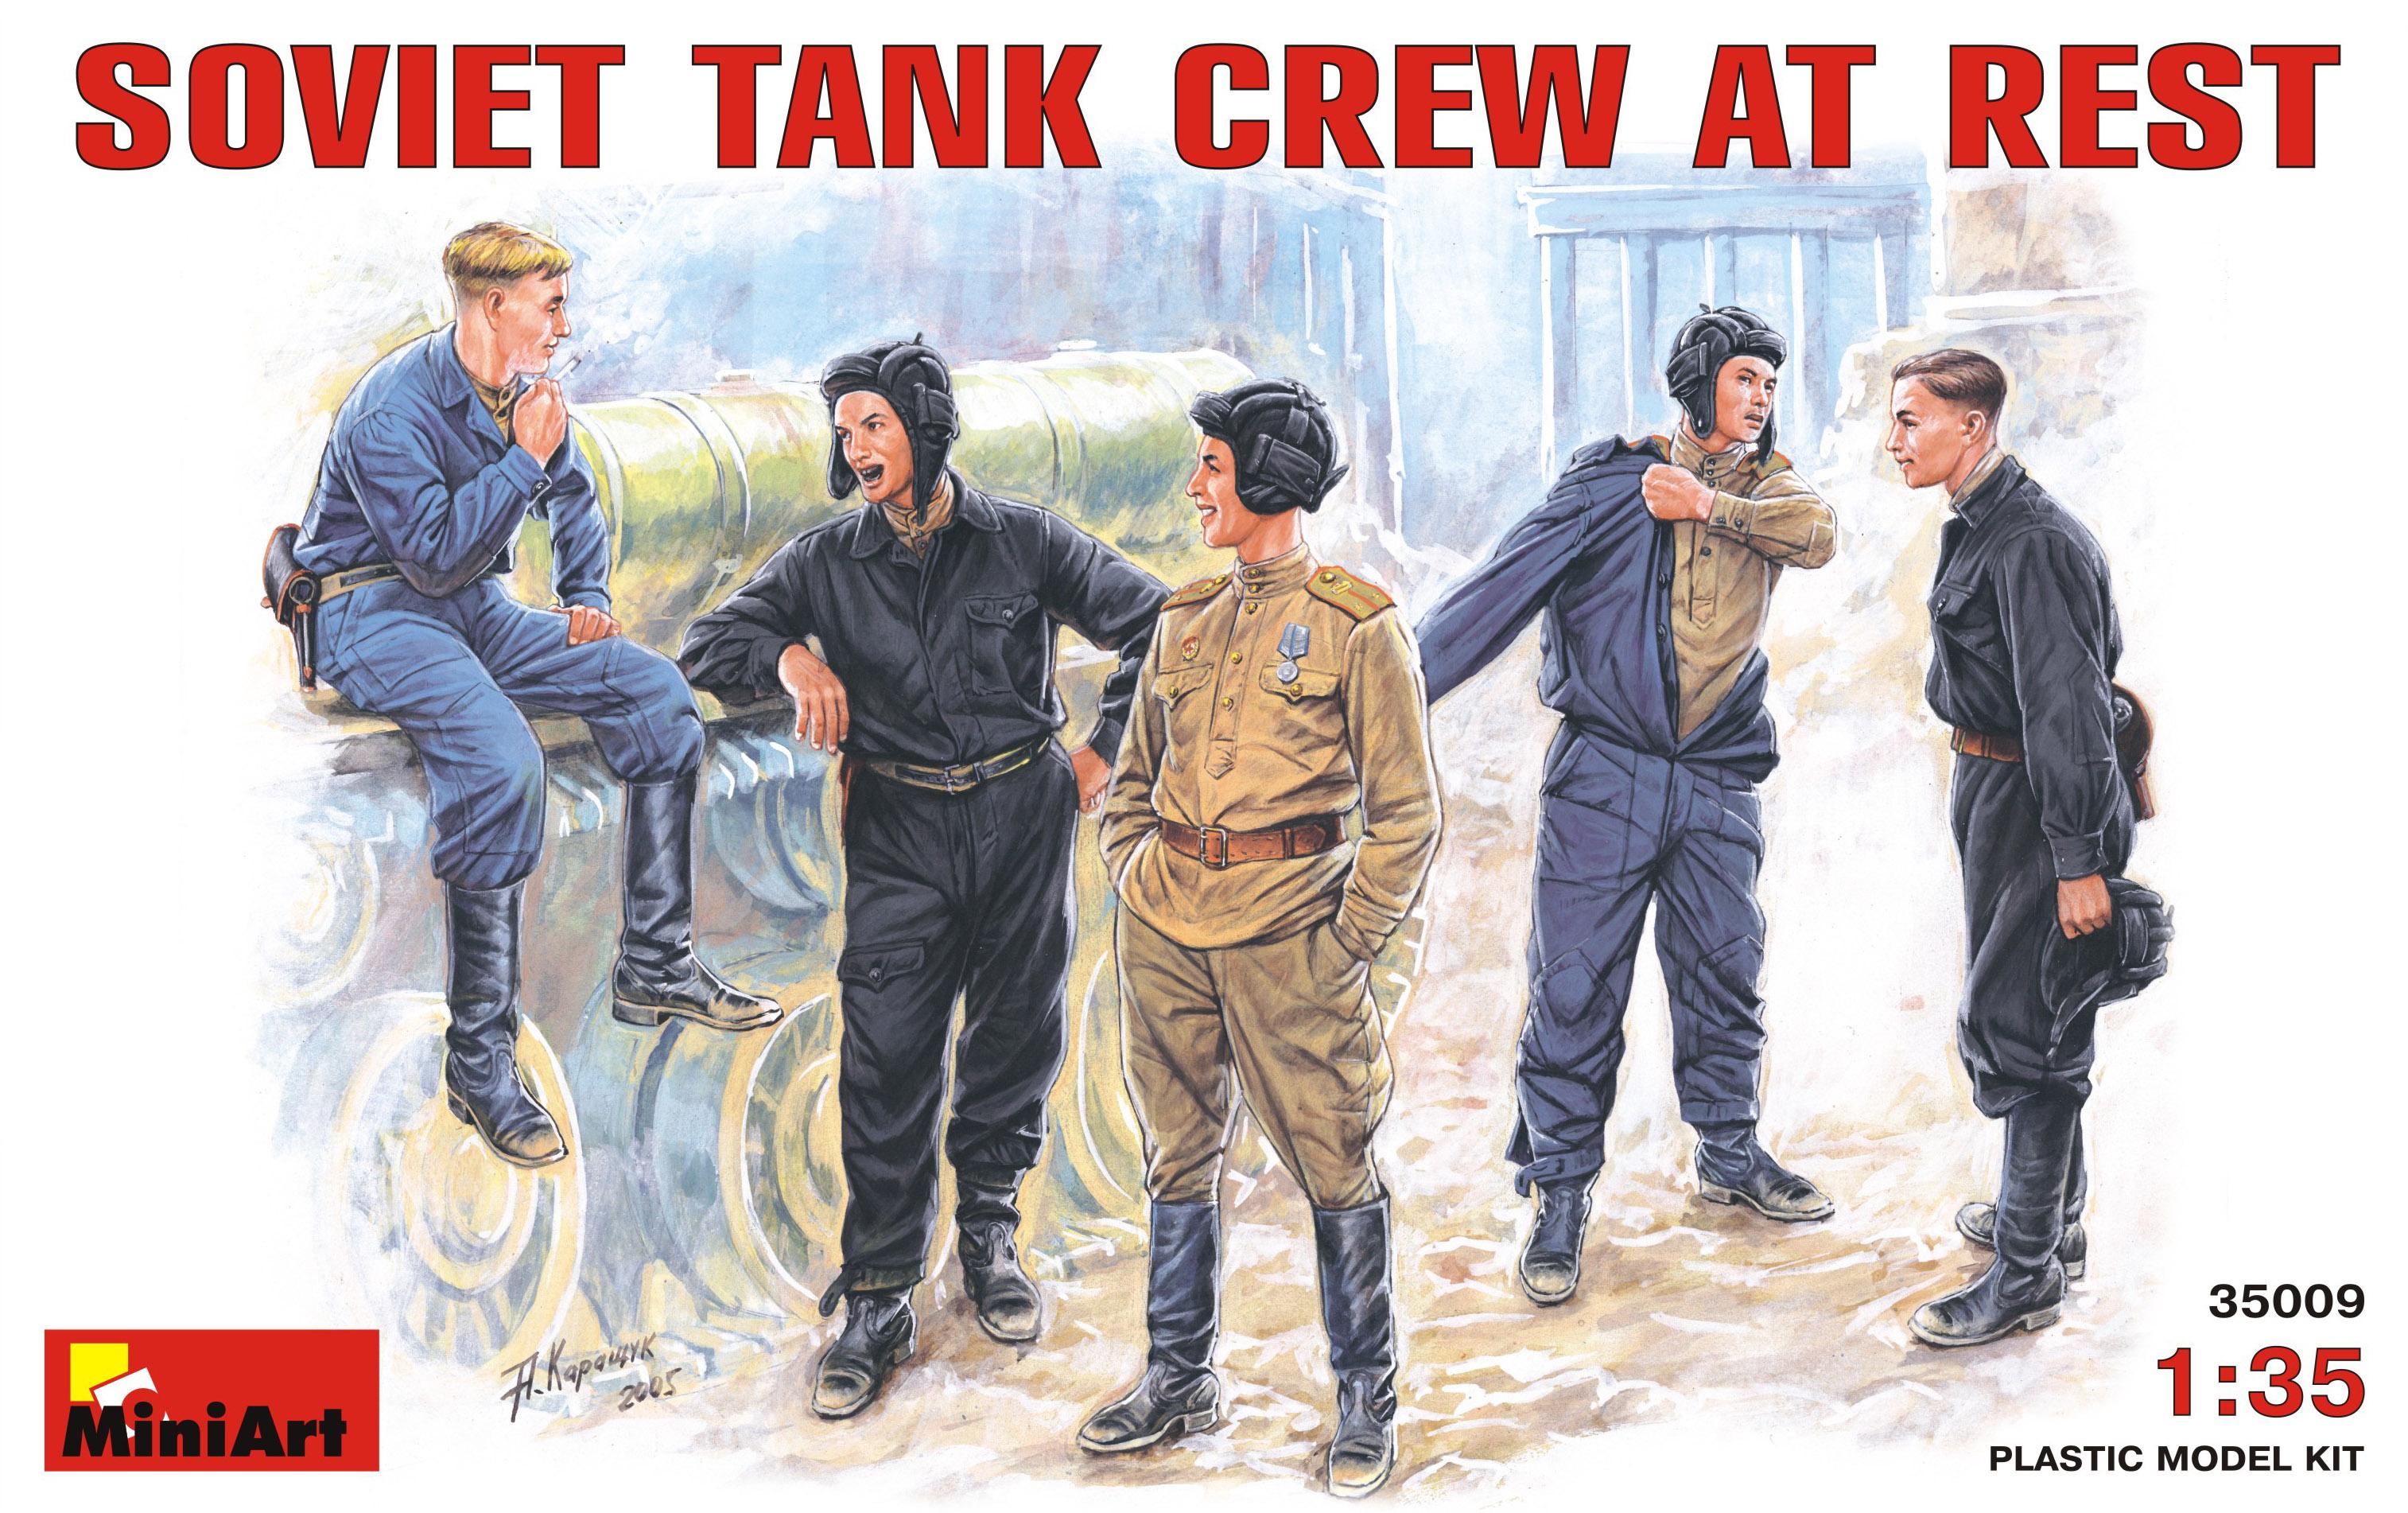 SOVIET TANK CREW AT REST